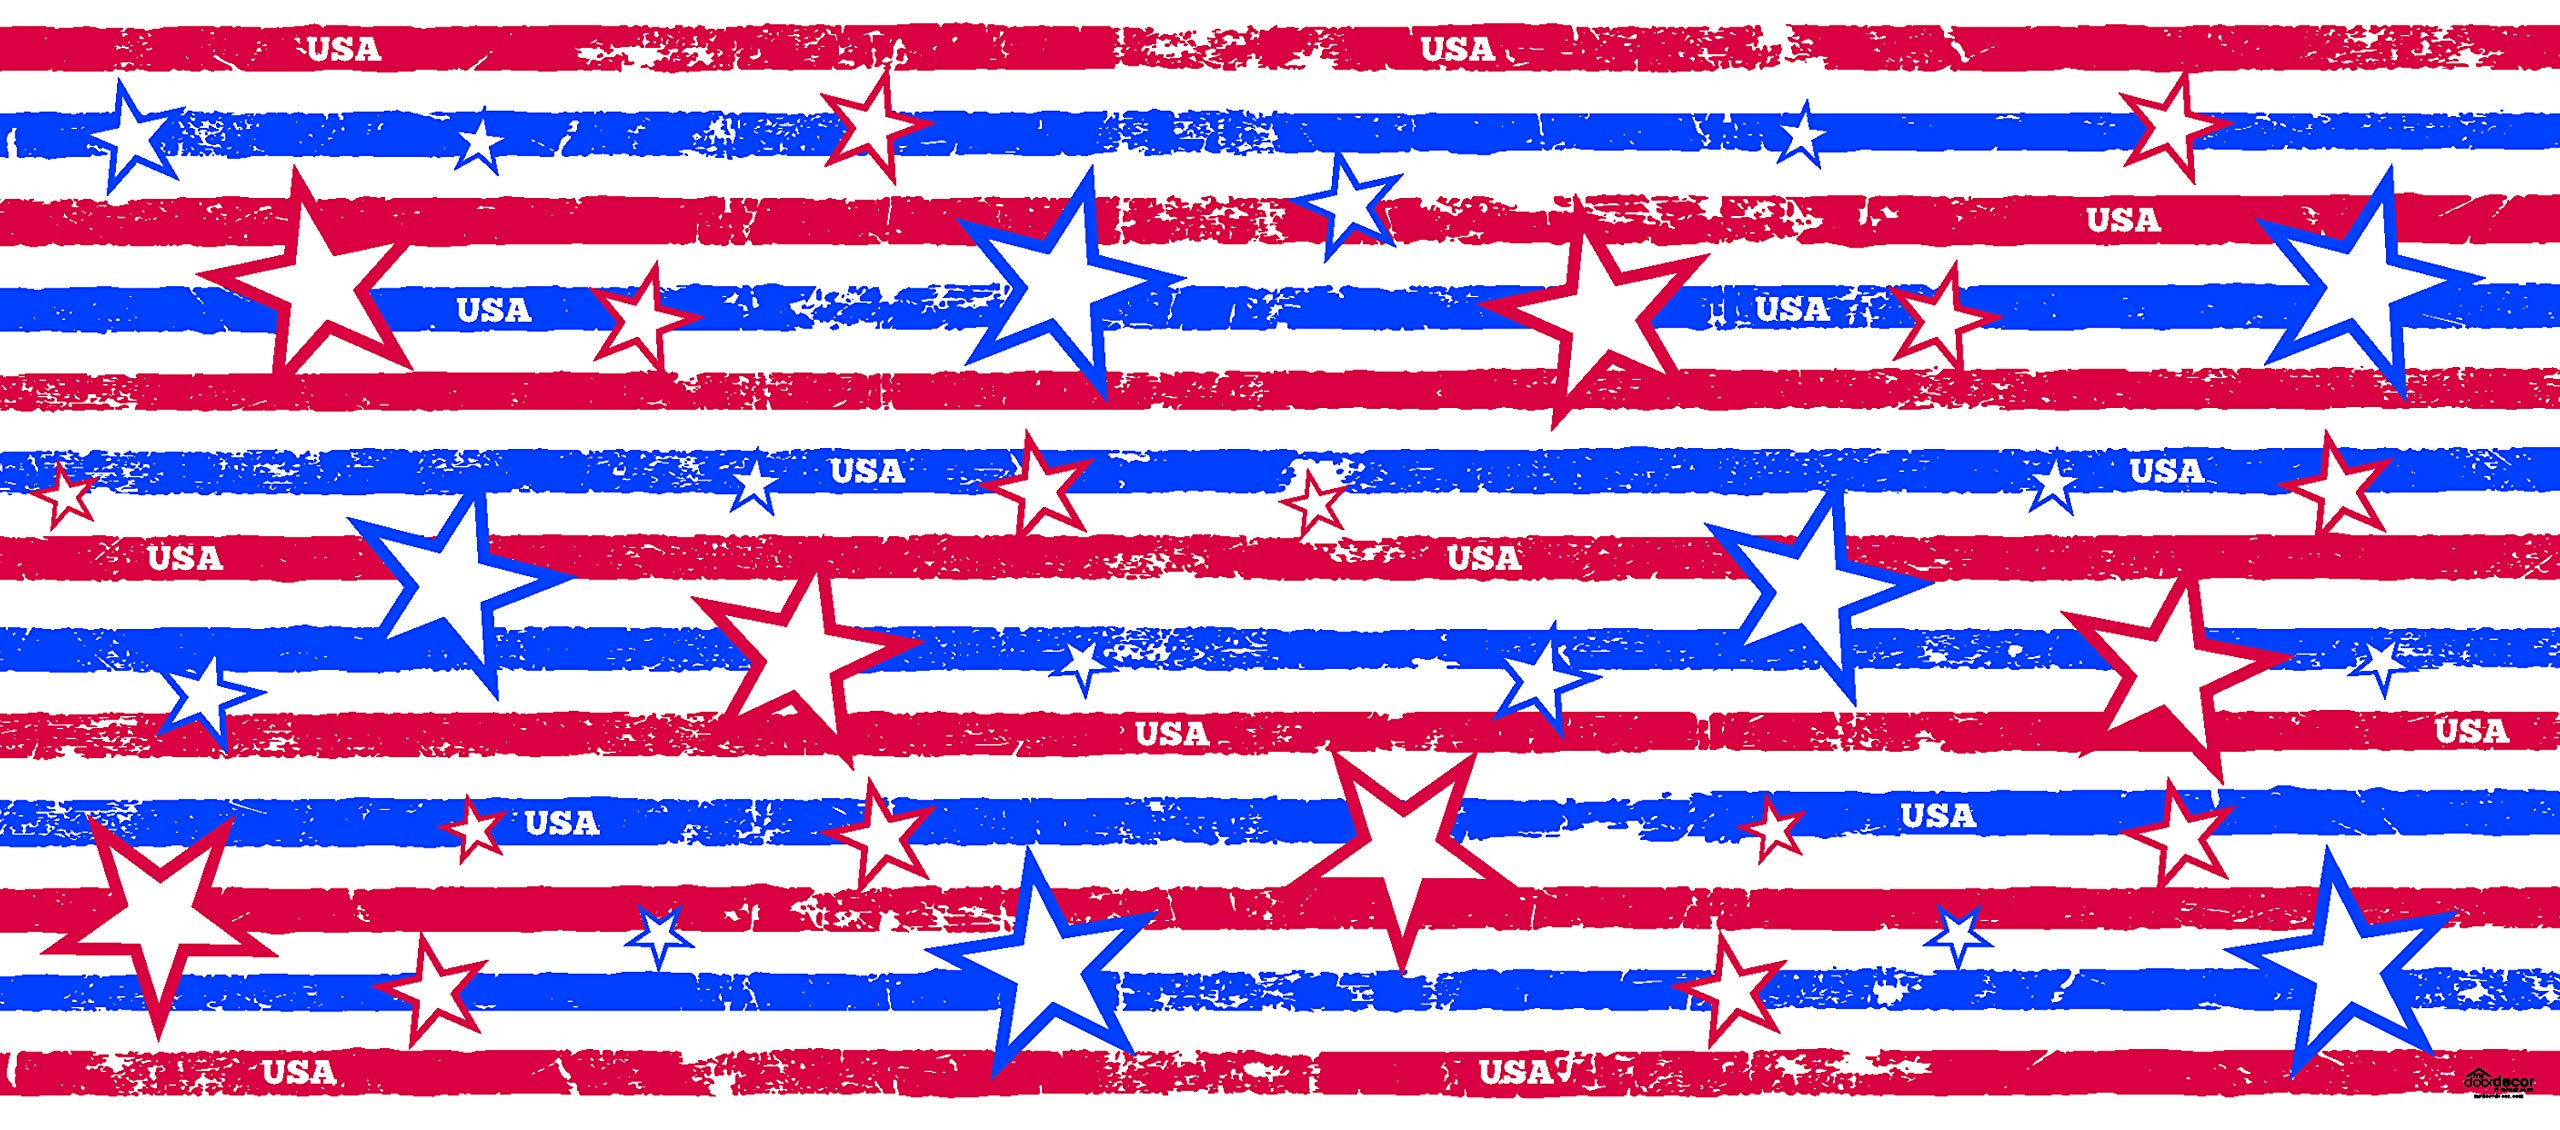 Victory Corps Stars and Stripes - Patriotic Garage Door Banner Mural Sign Décor 7'x 16' Car Garage - The Original Holiday Garage Door Banner Decor